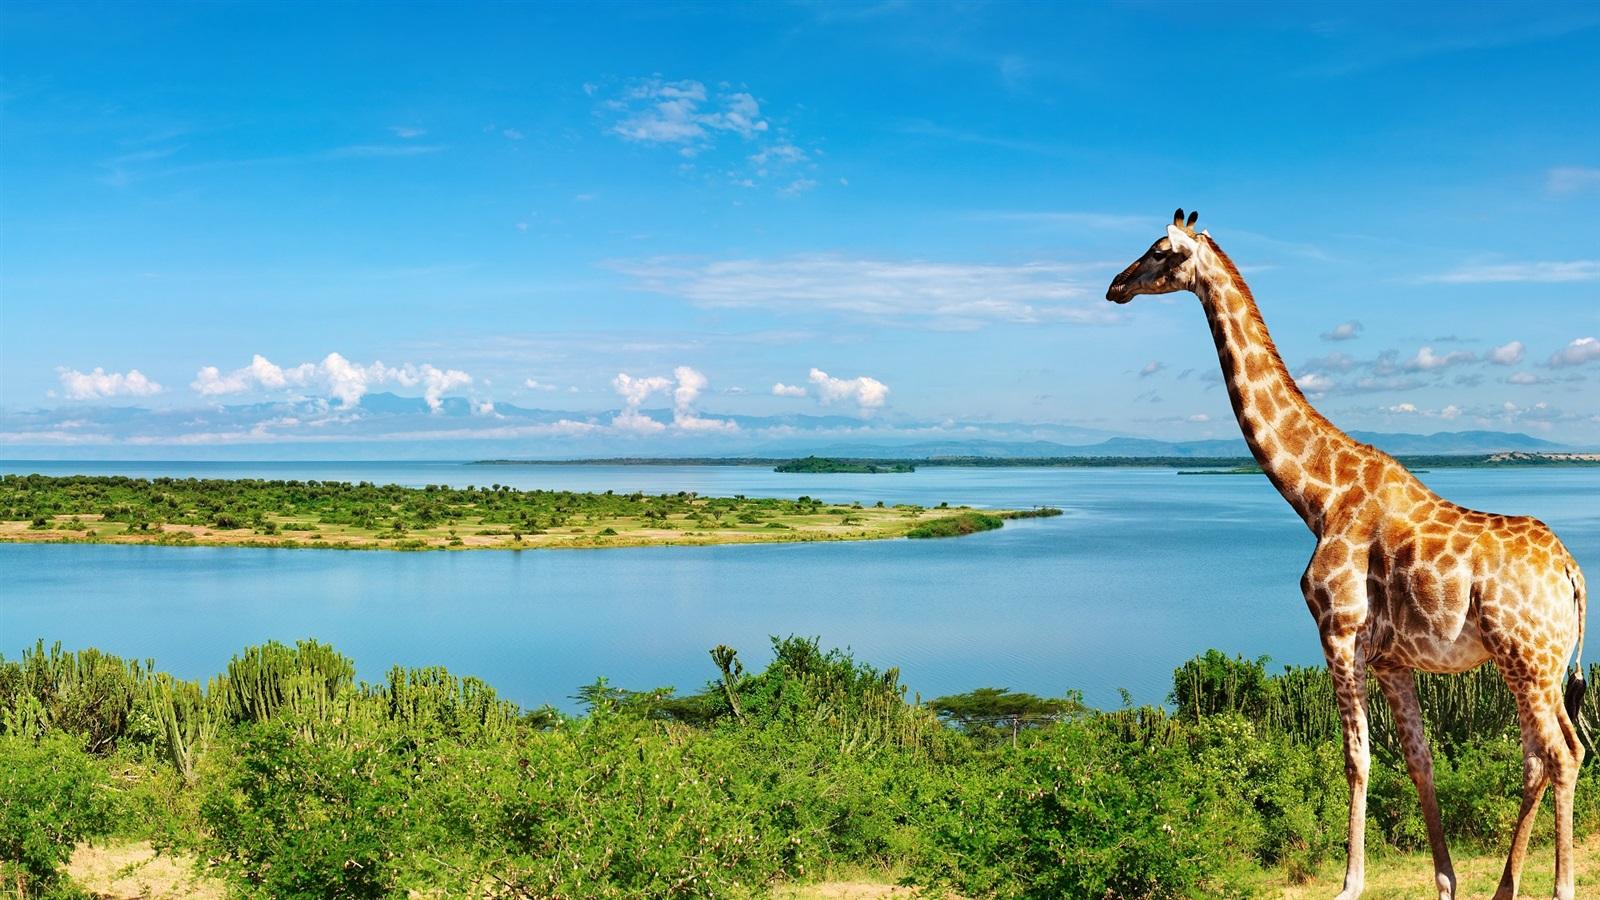 Giraffe am Nil Seite Afrika 1920x1080 Full